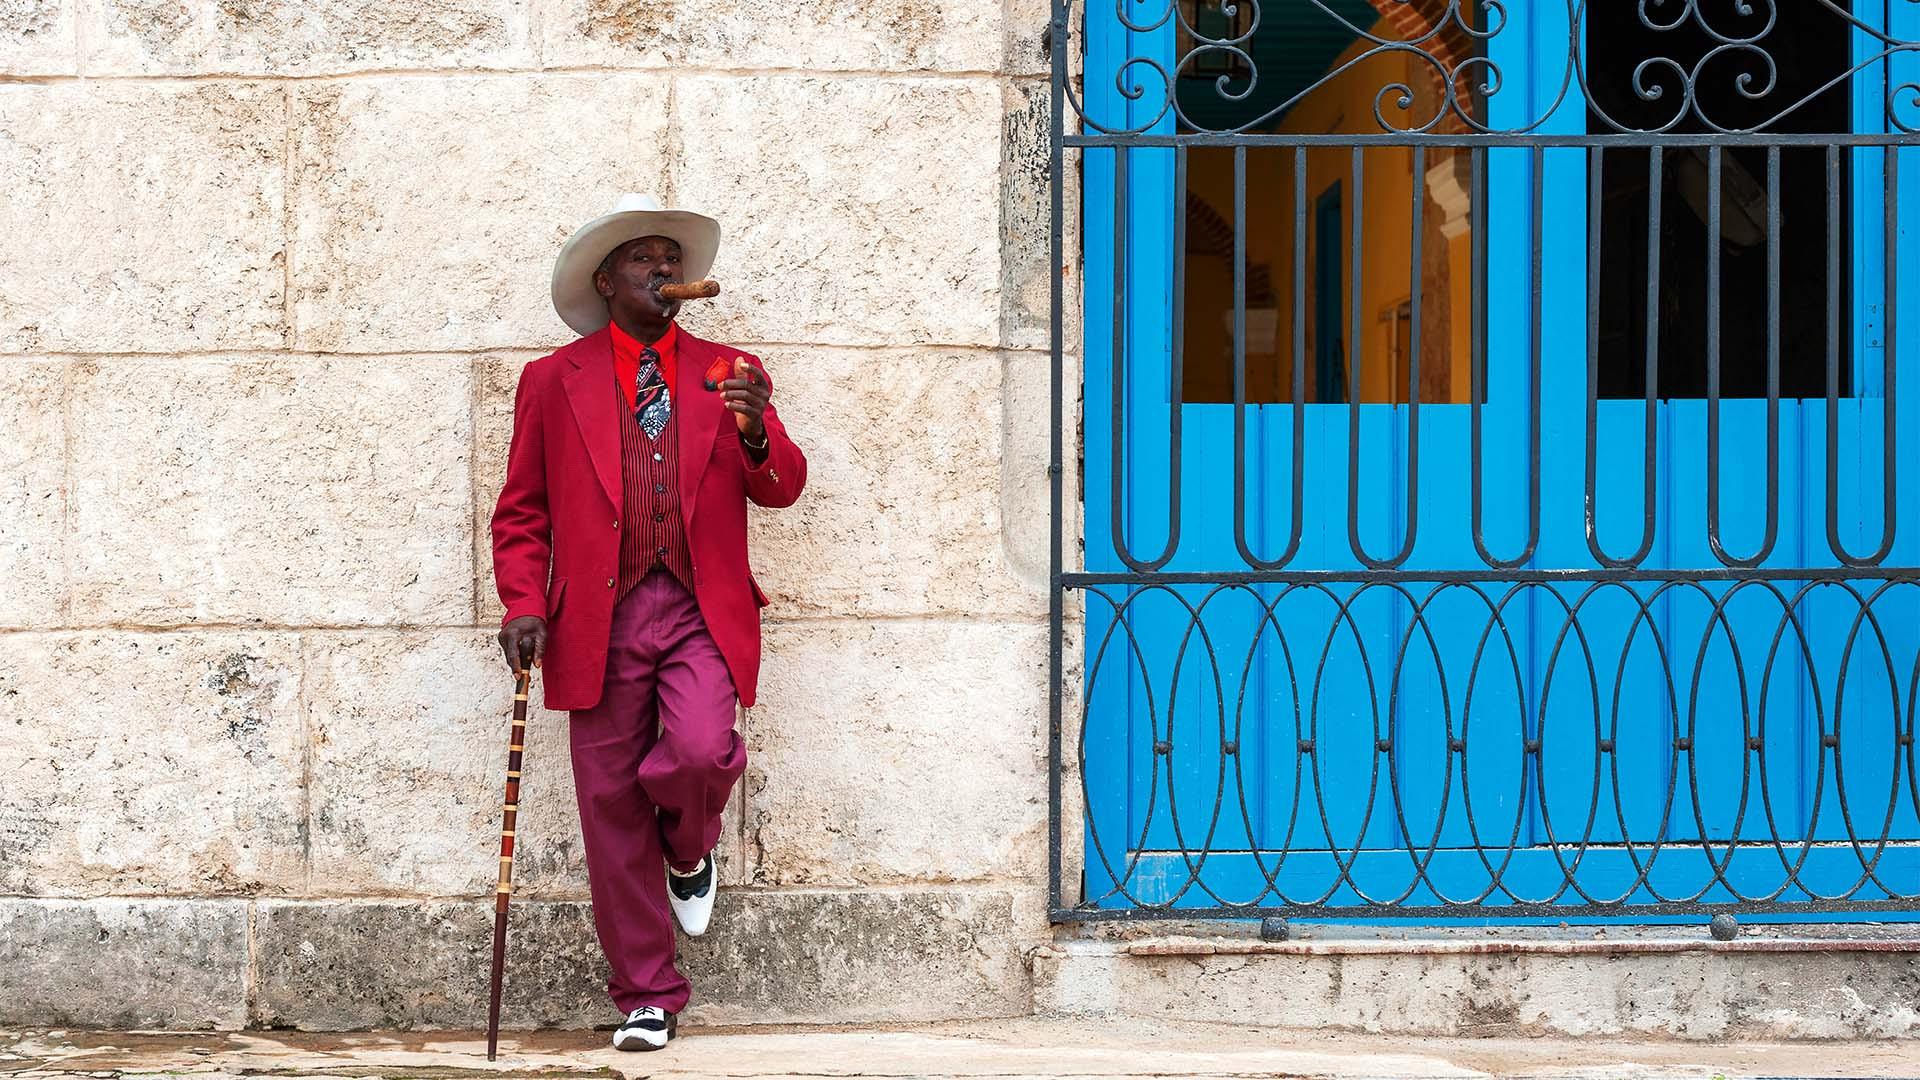 A man smoking a cigar on the street in Cuba